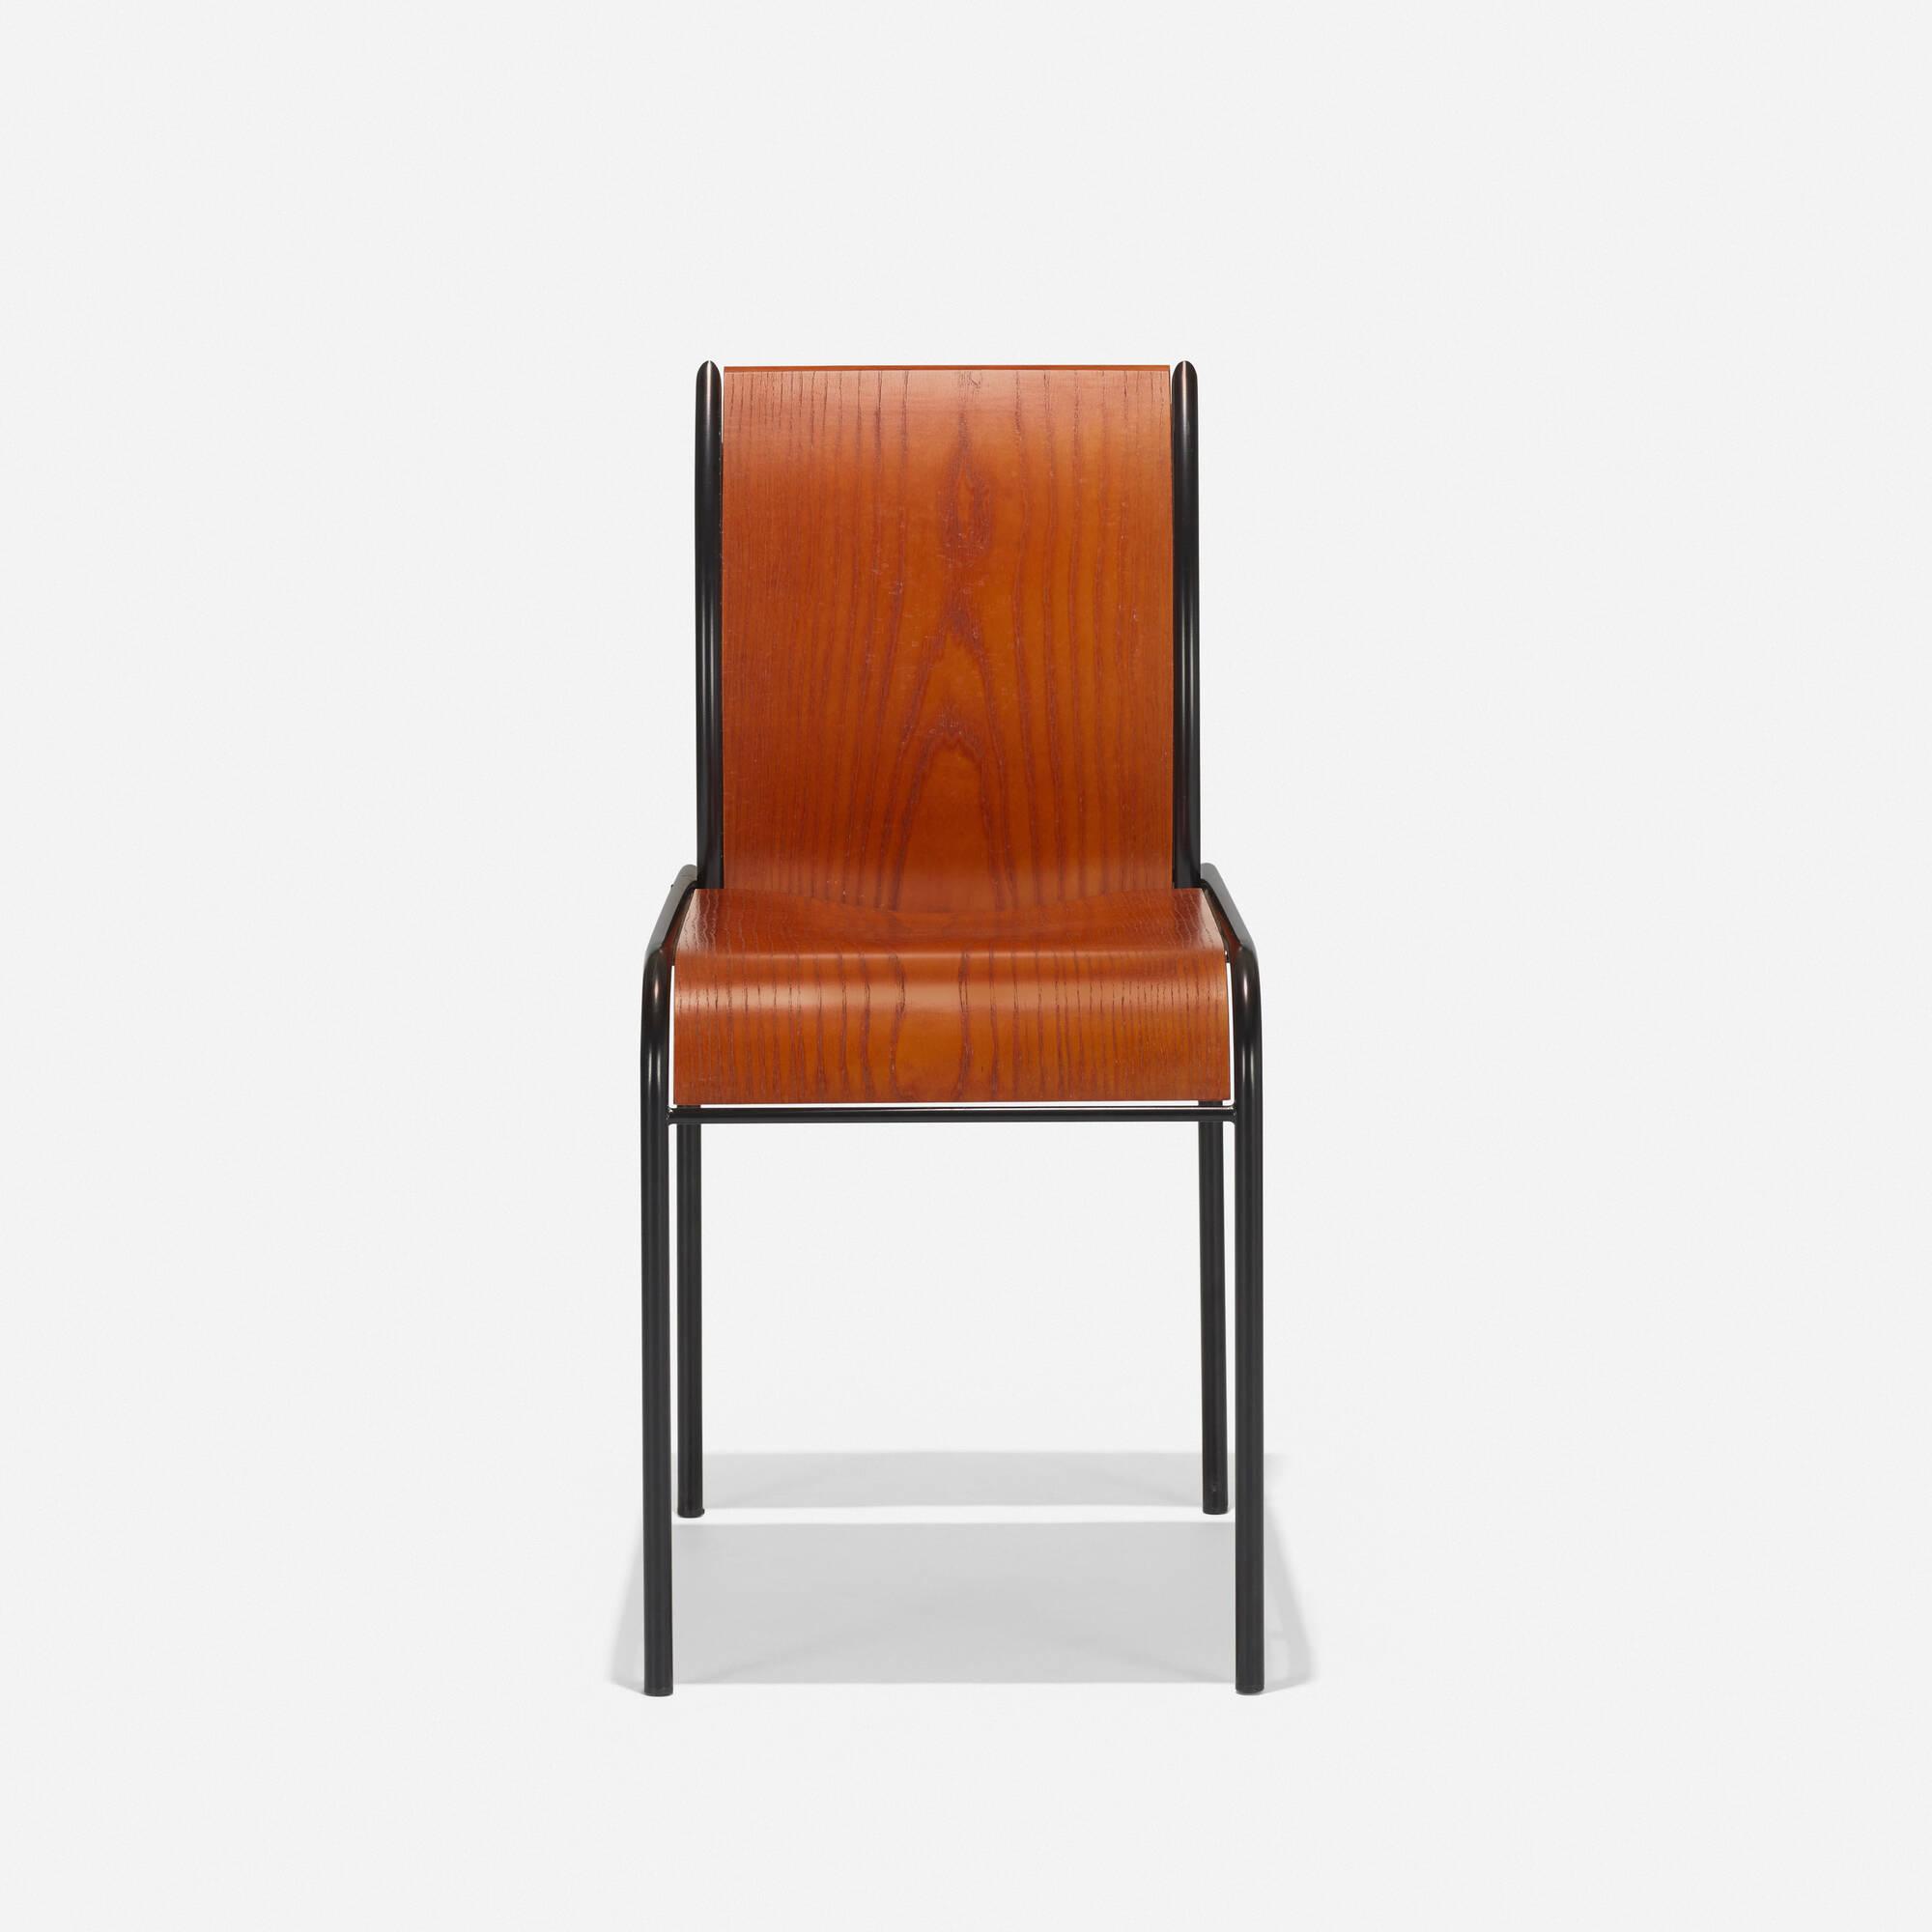 402: Michele De Lucchi / Kim chair (2 of 3)